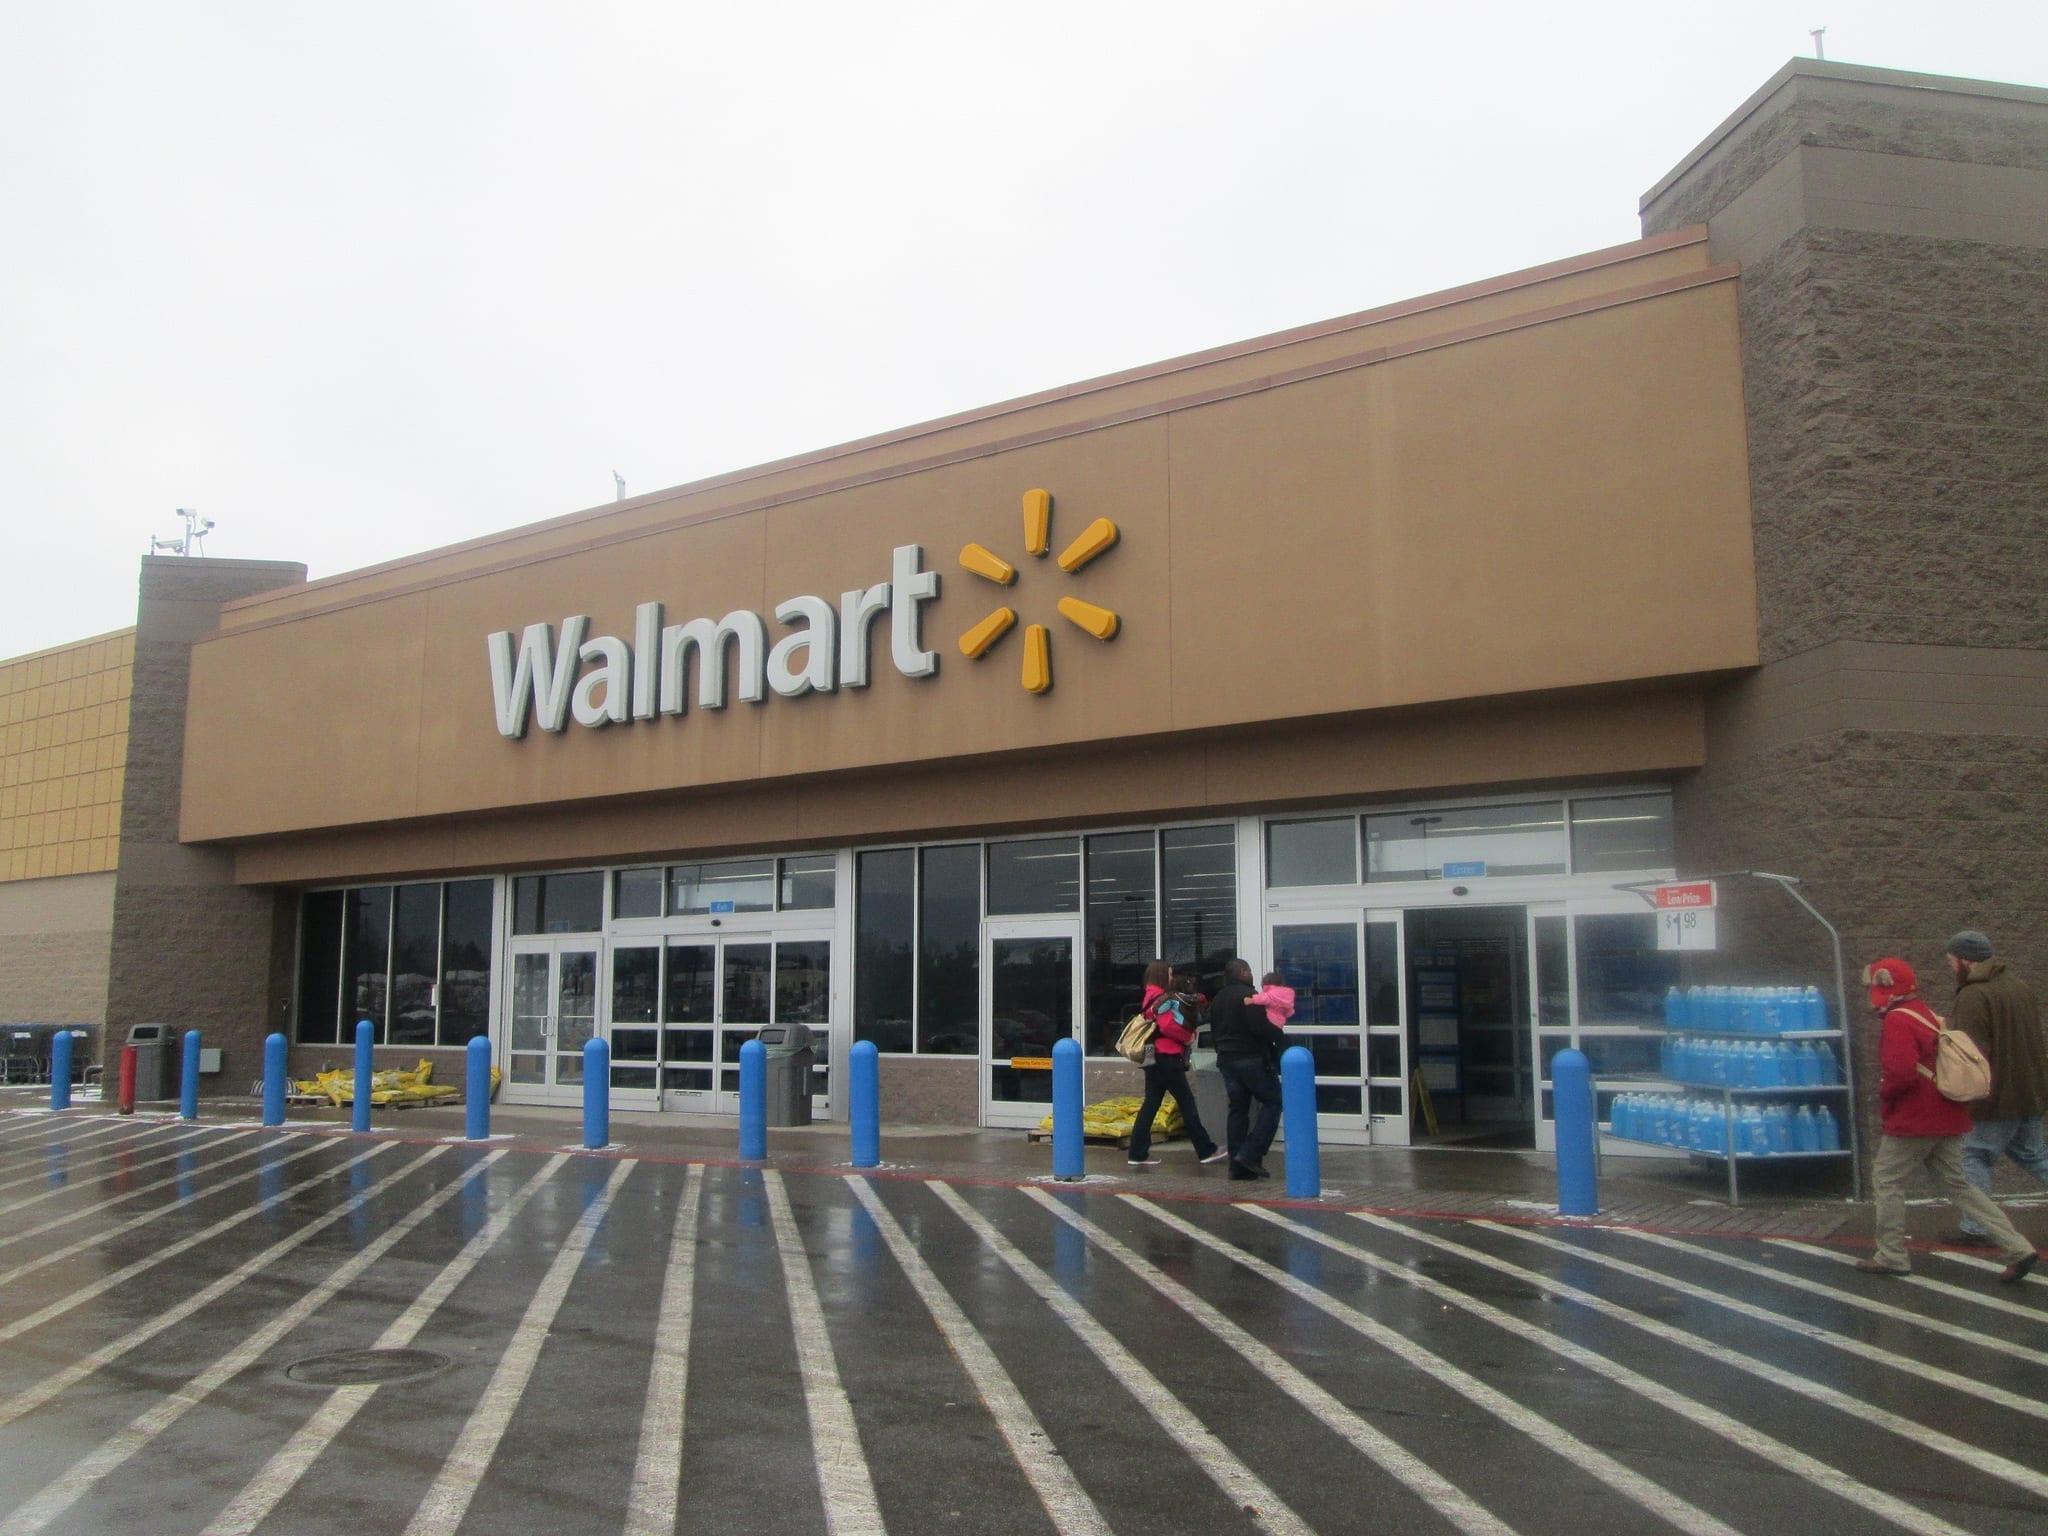 Walmart entrance; image by Random Retail, via Flickr, CC BY 2.0, no changes.